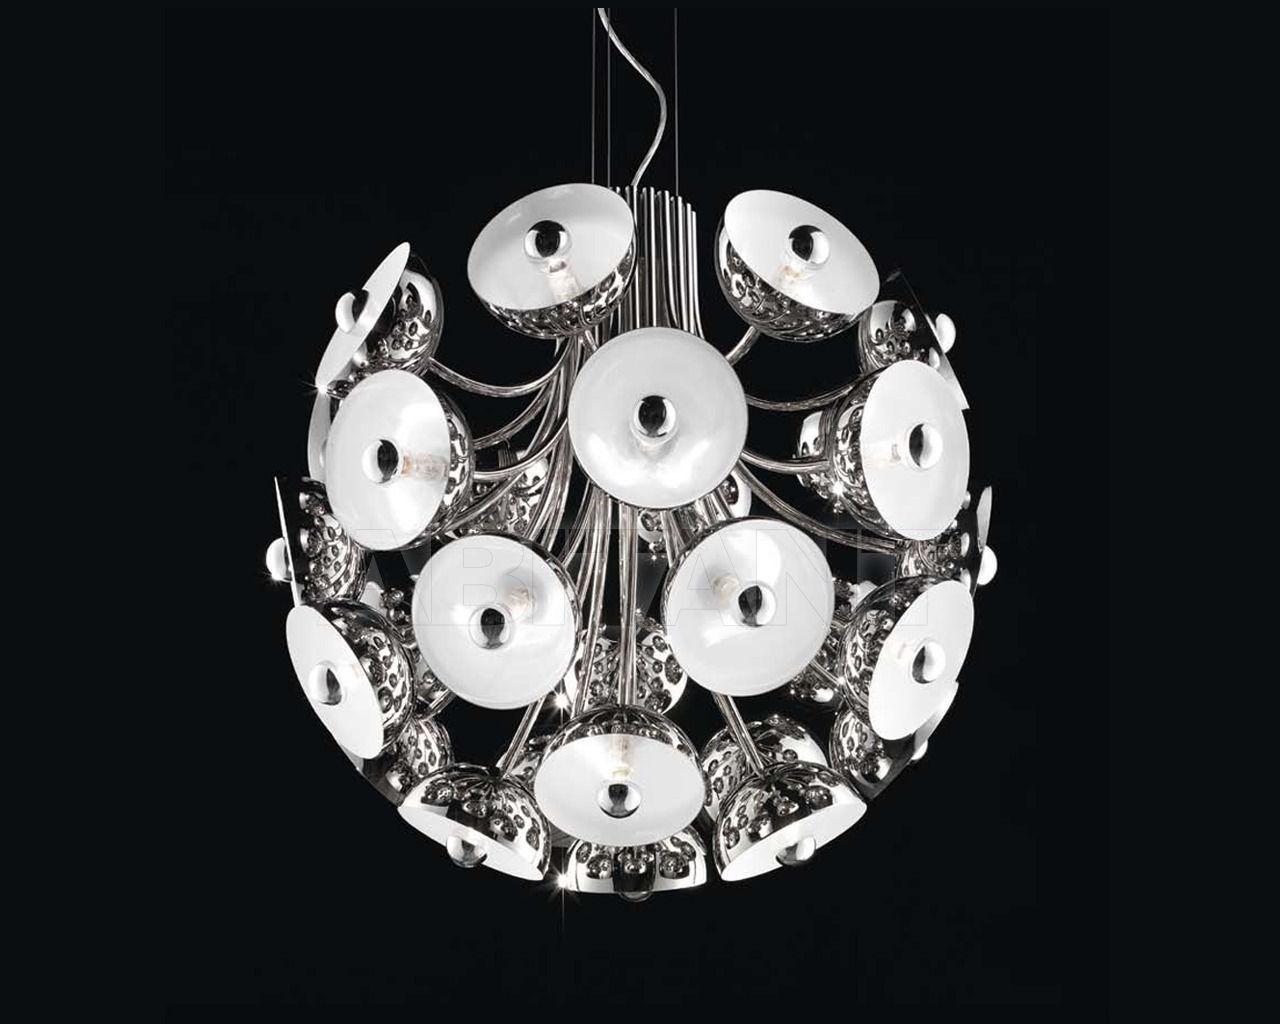 Купить Люстра SYMPHONY LA 75 Luci Italiane (Evi Style, Morosini) Plus 2010 ES0160LA04BIIN